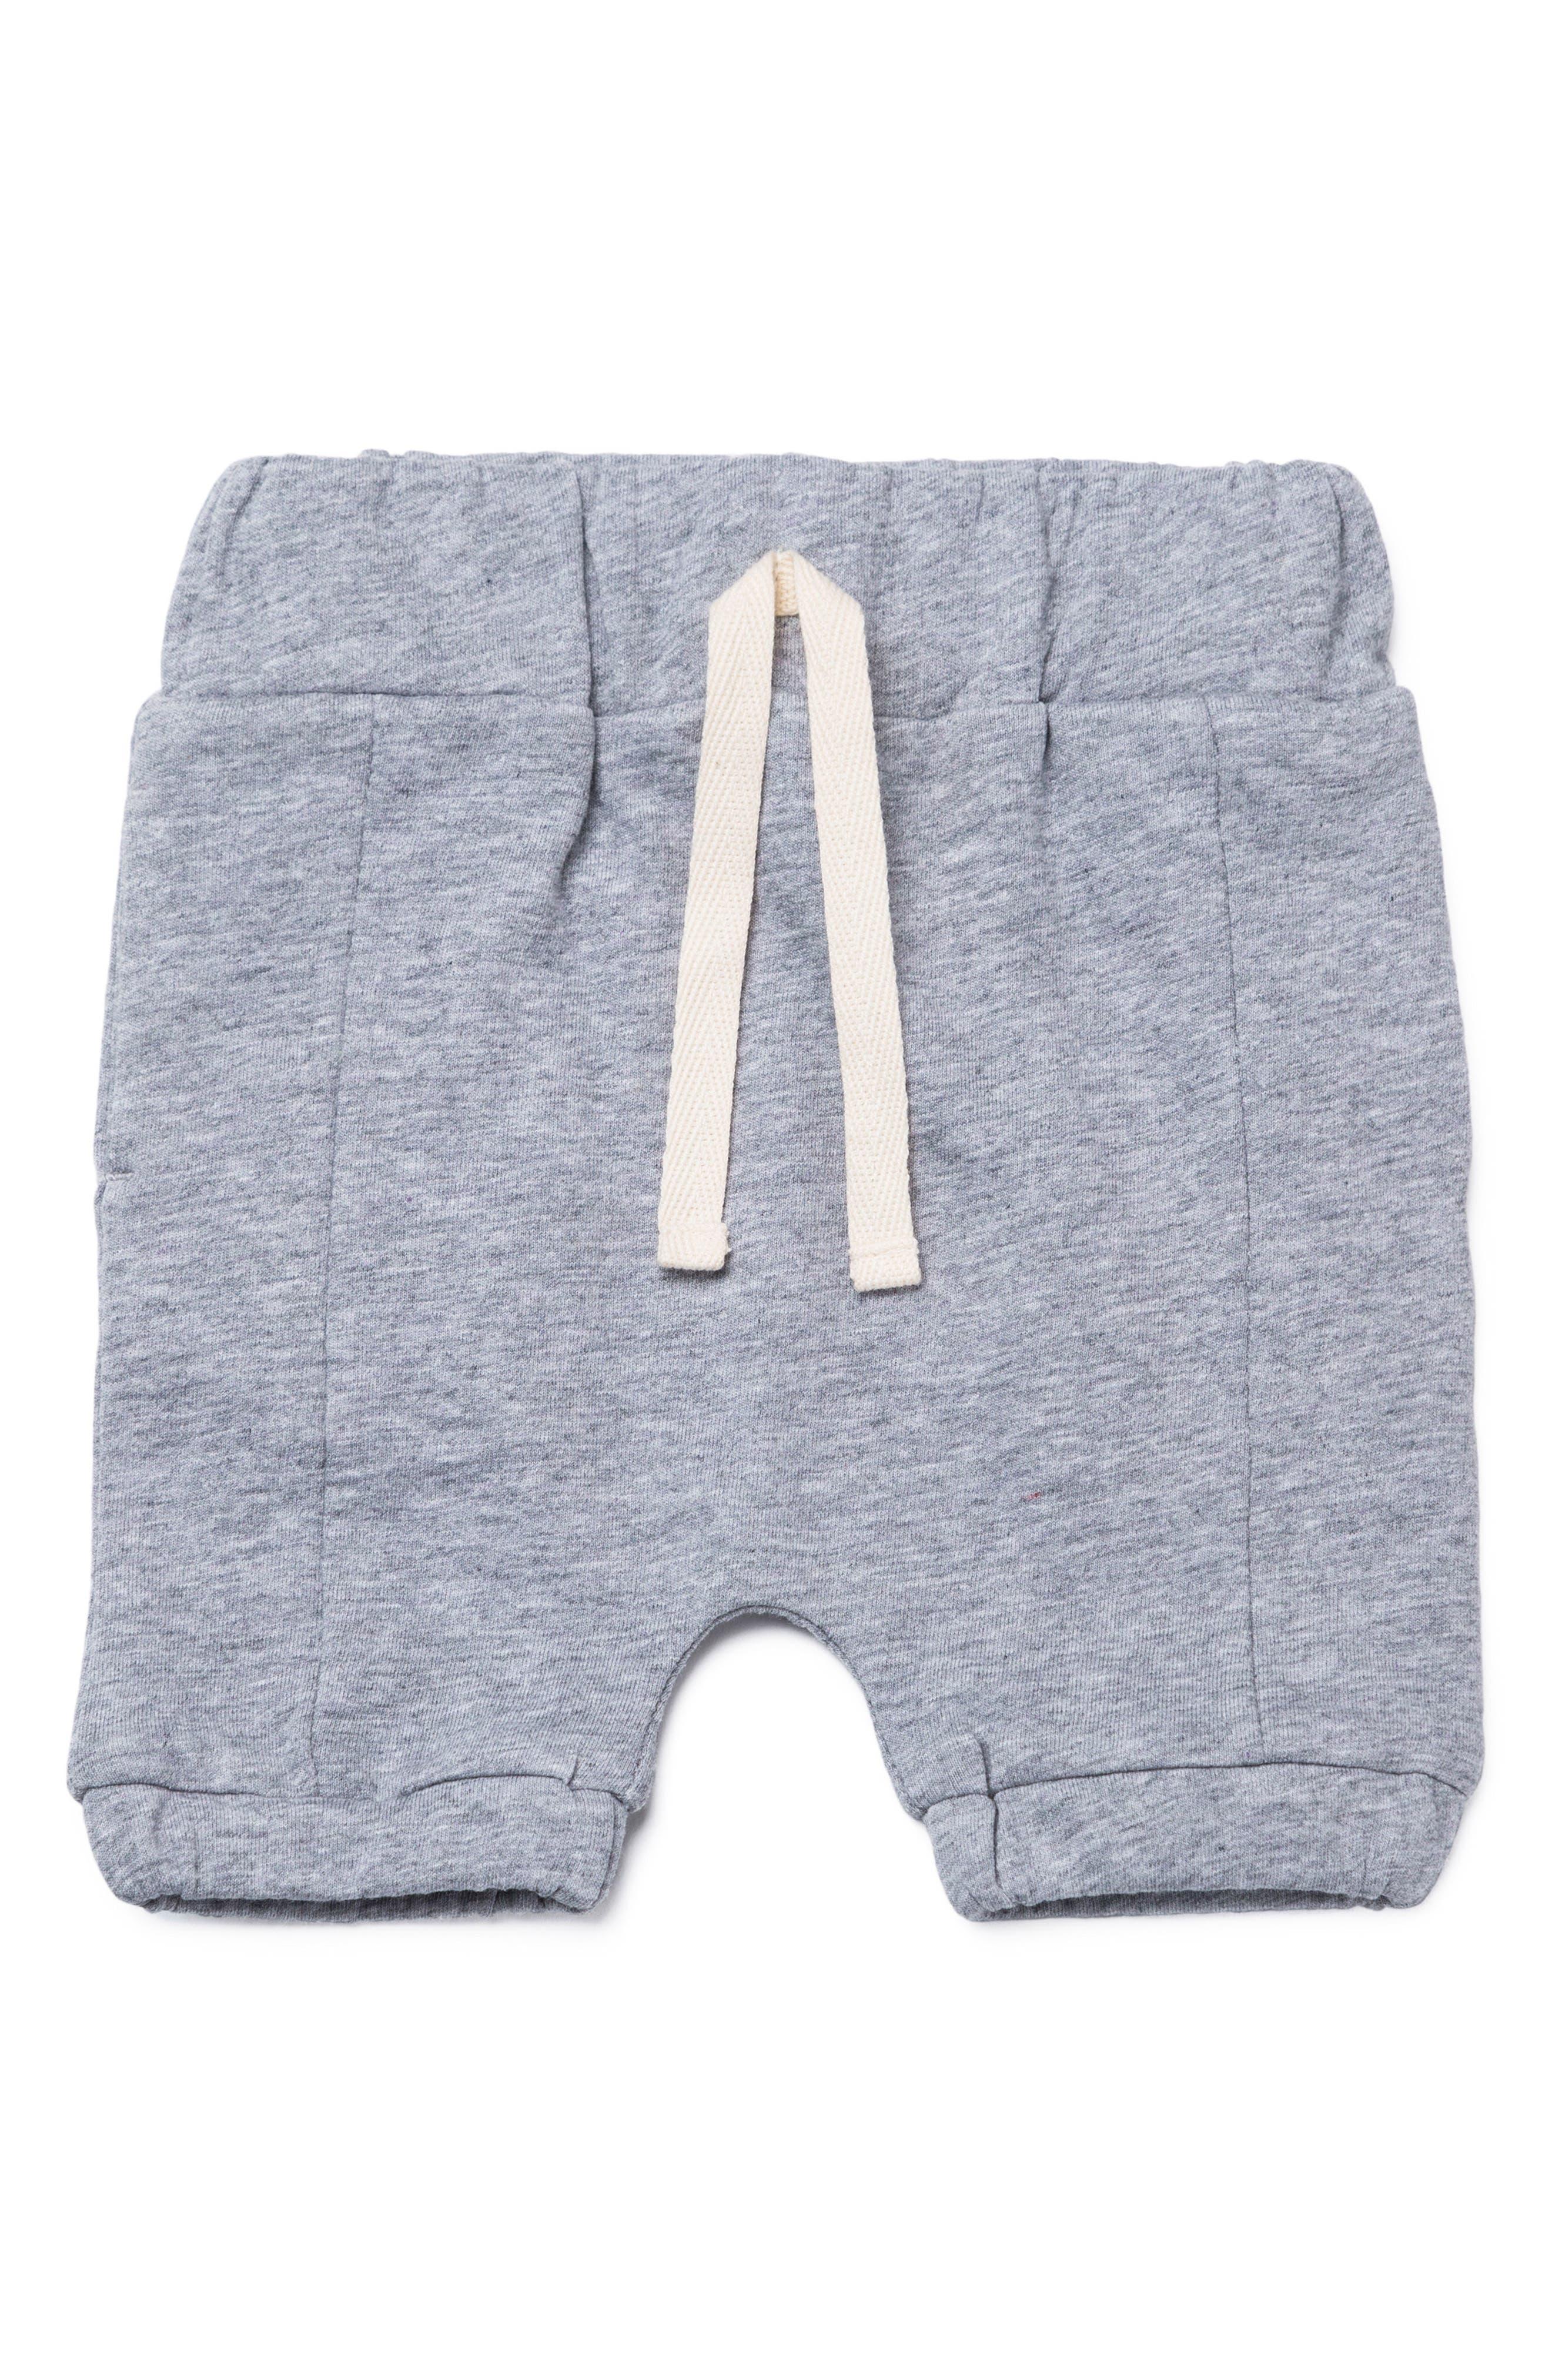 Beach Organic Cotton Jogger Pants,                         Main,                         color, Heather Grey